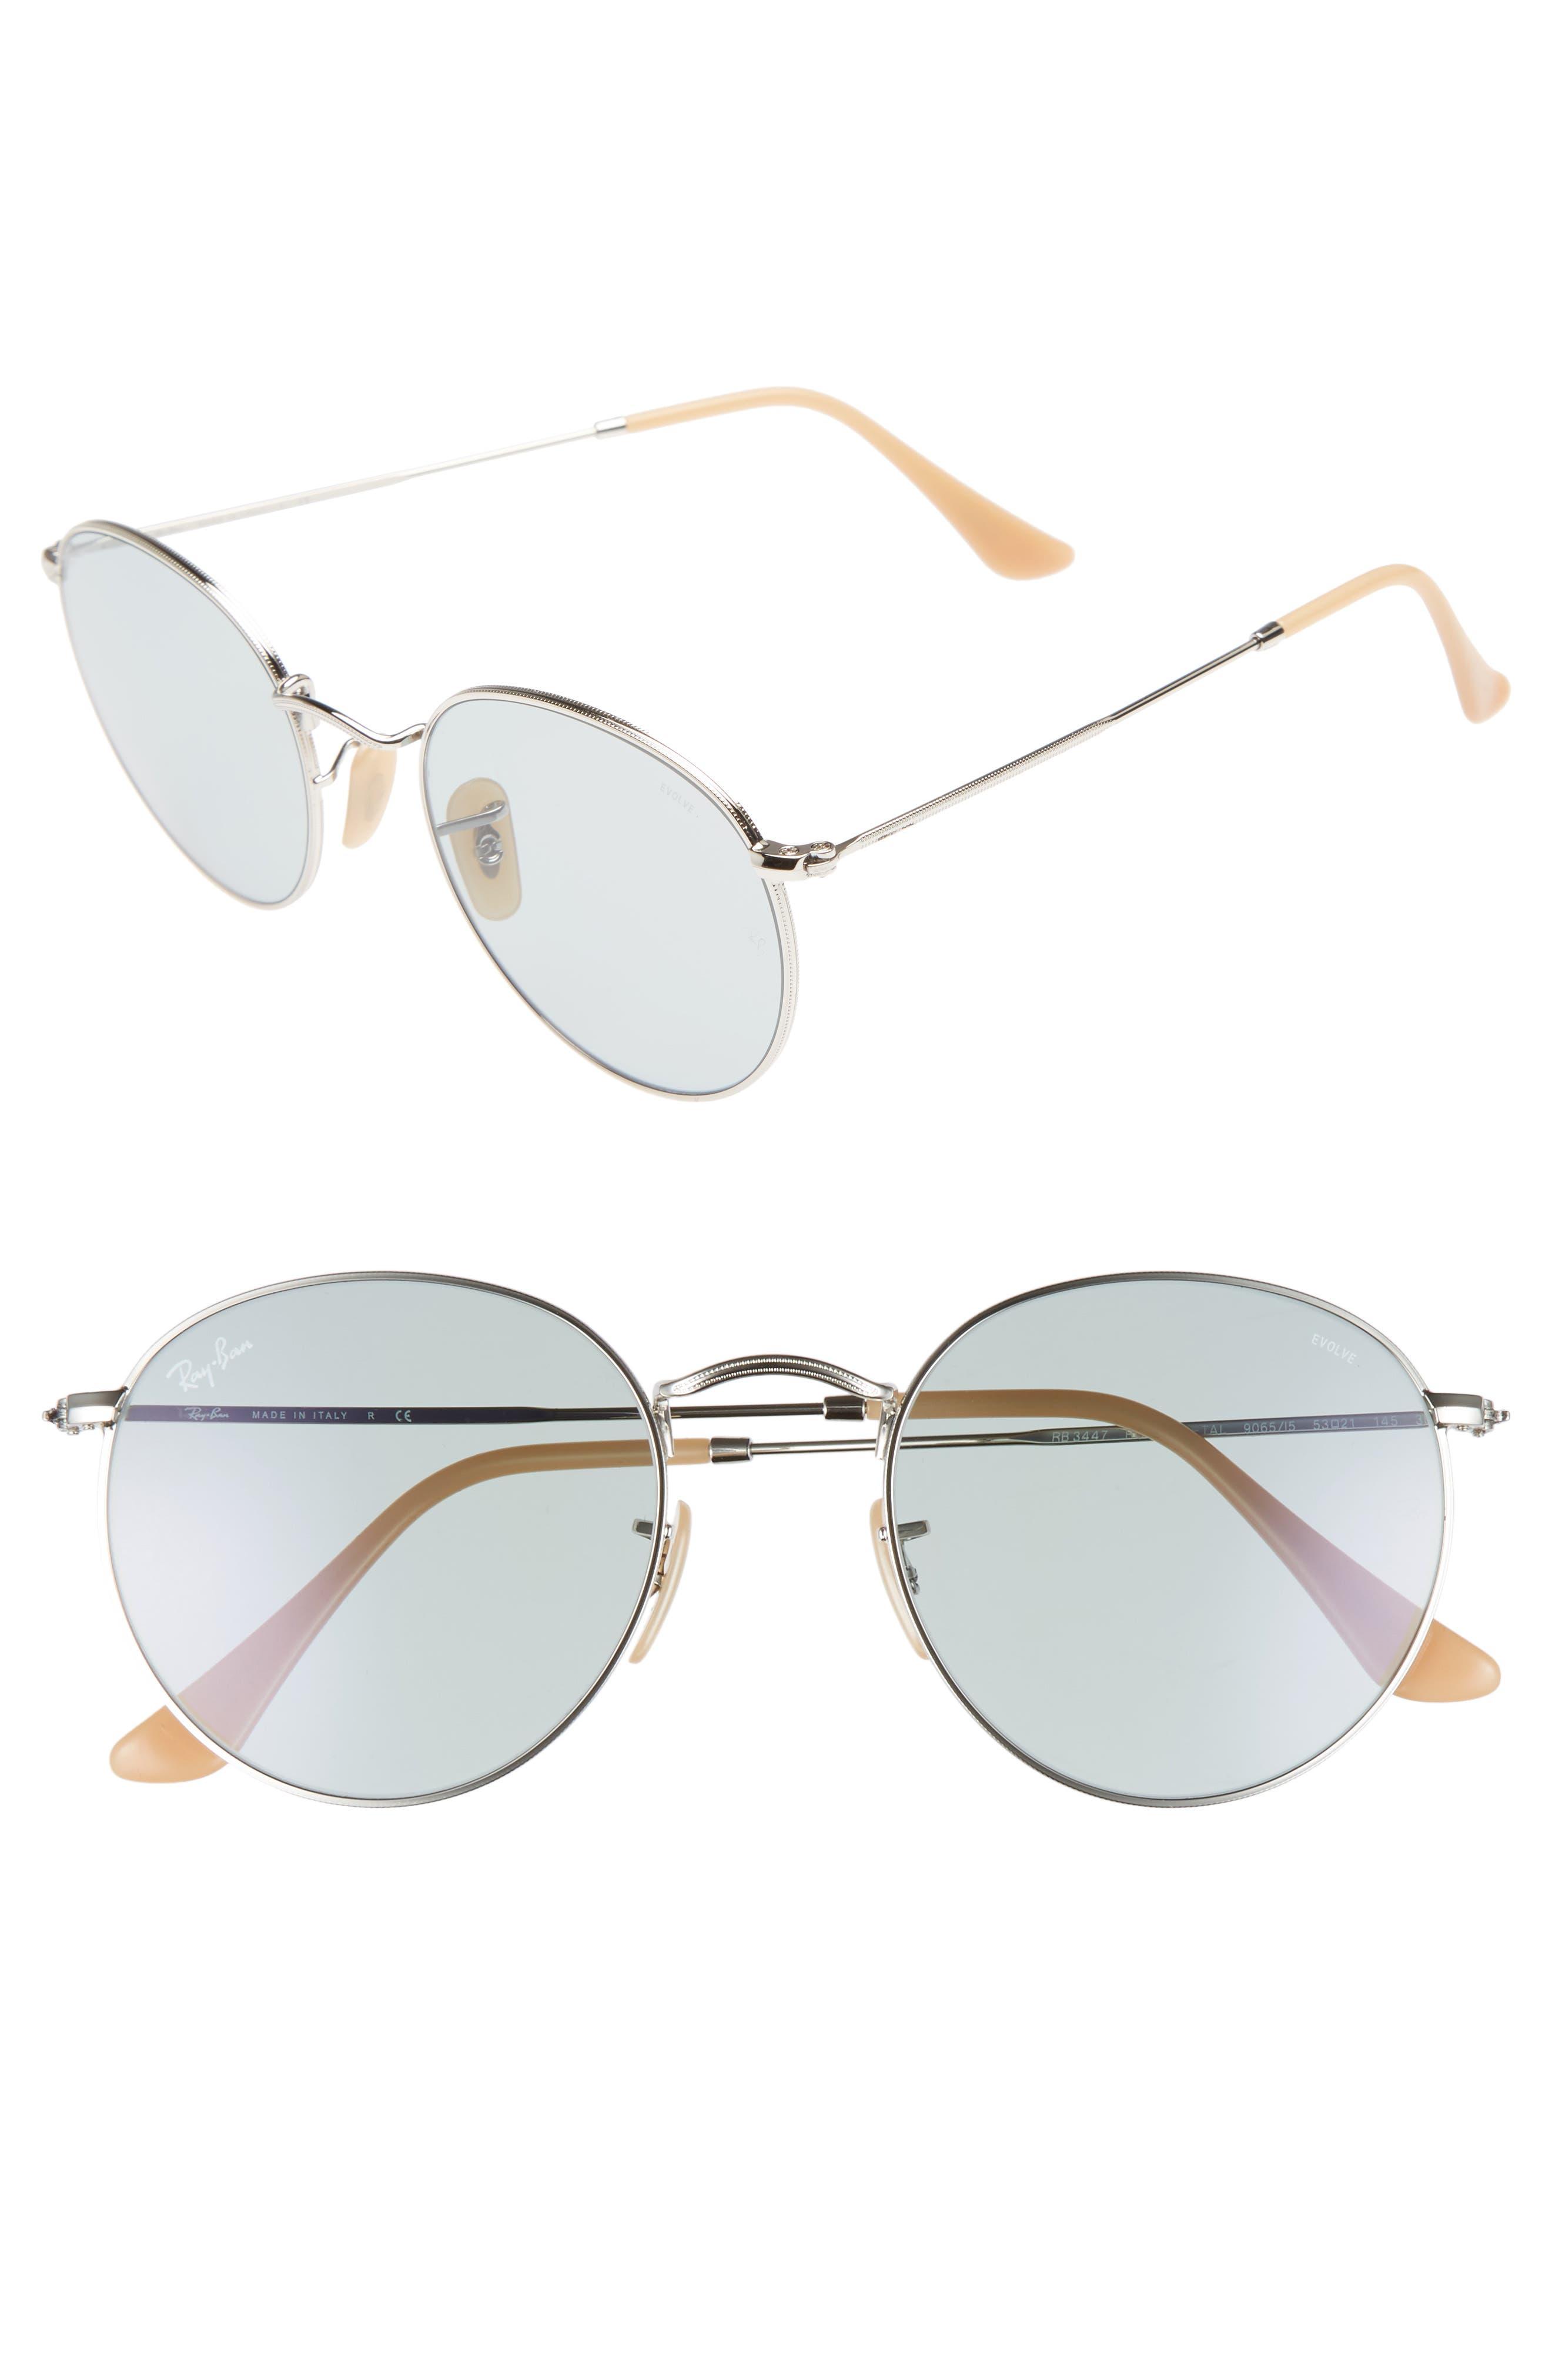 53mm Polarized Round Sunglasses,                         Main,                         color, Silver Blue